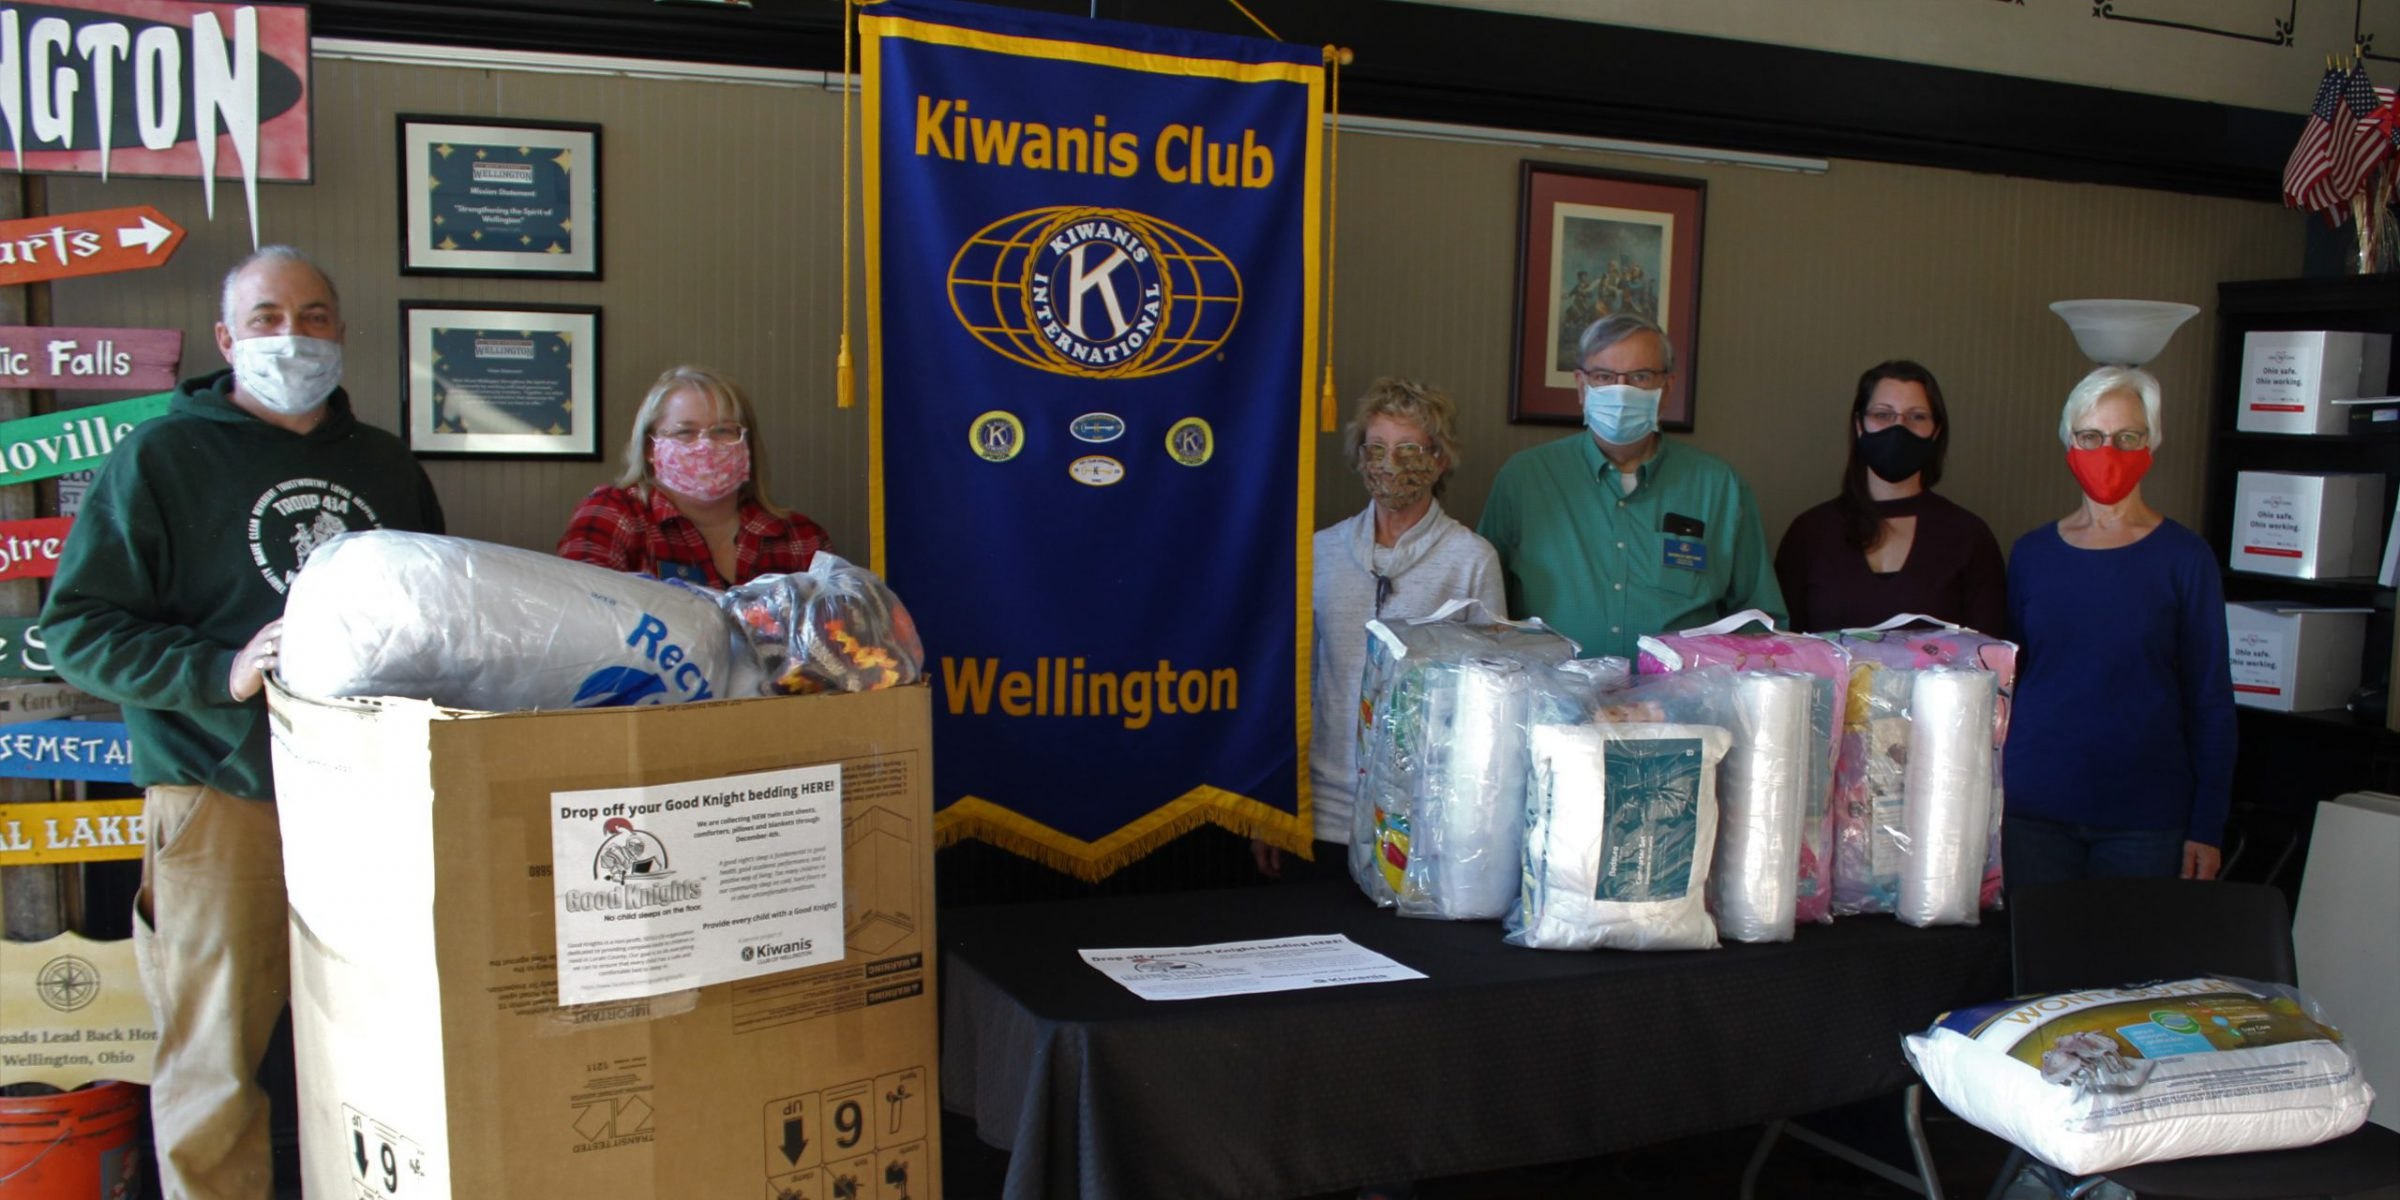 Kiwanis Club of Wellington